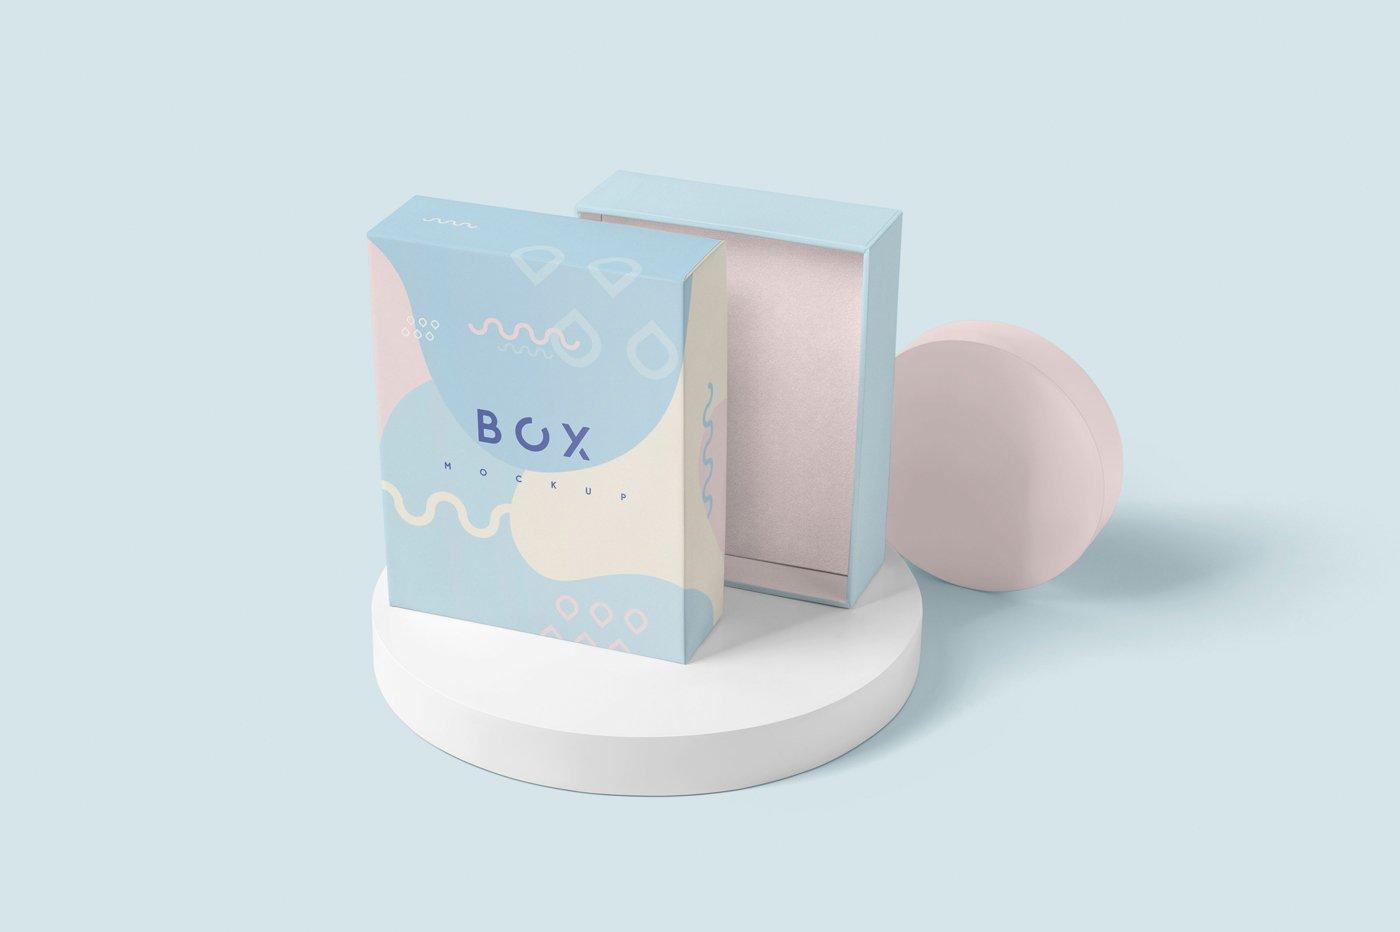 礼品包装纸盒设计展示样机模板 Slim Gift Packaging Box Mockups插图